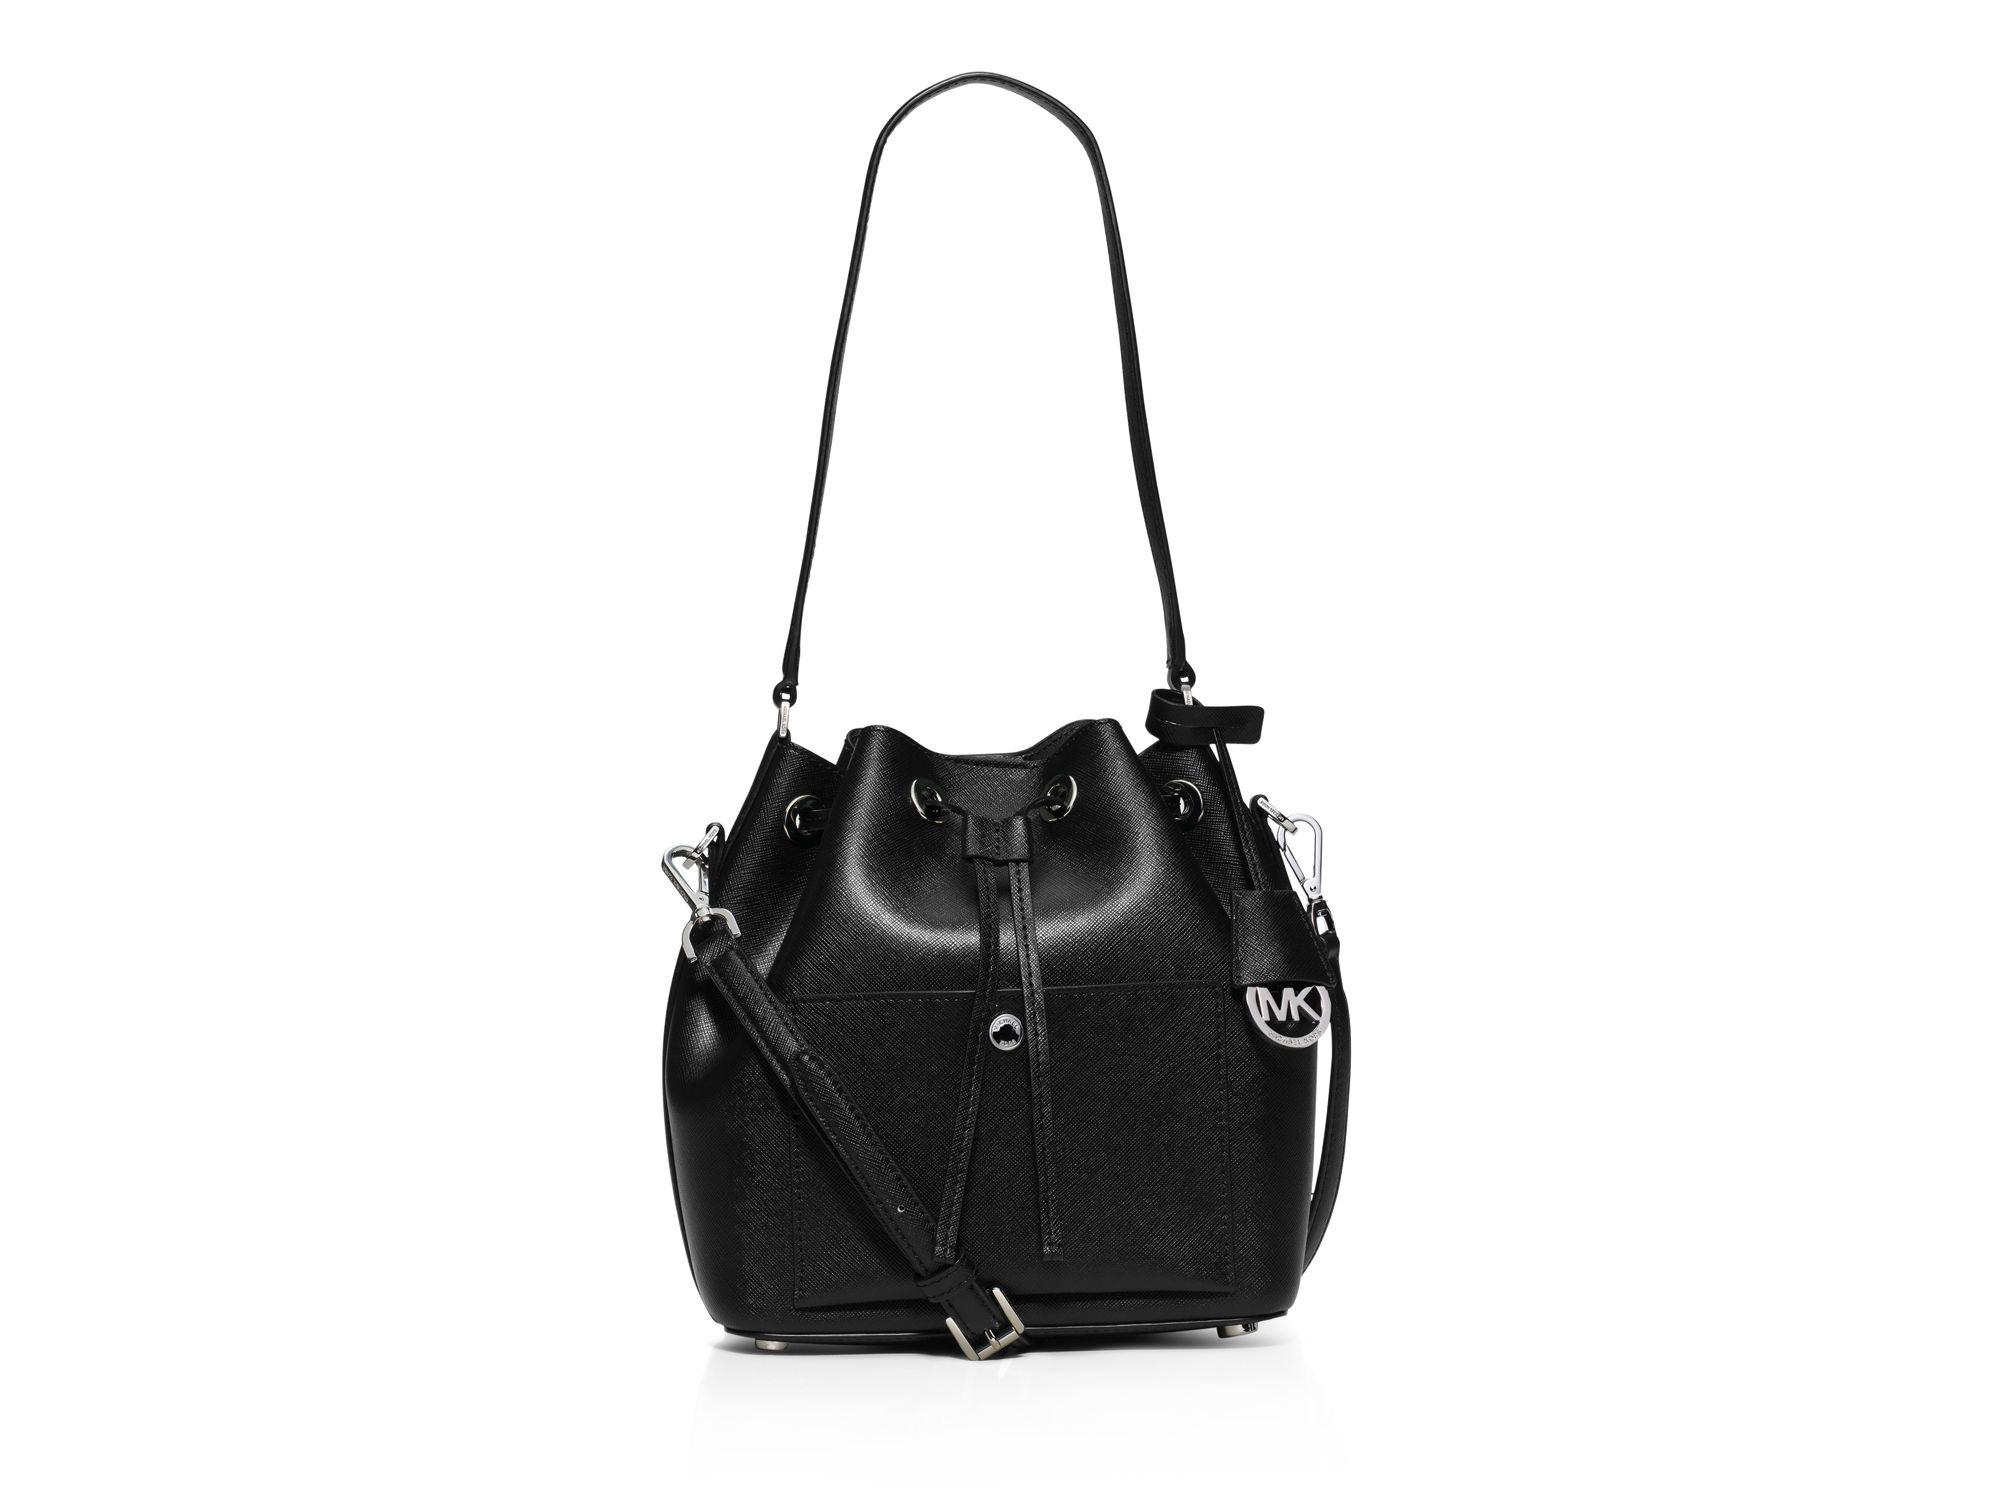 Lyst - MICHAEL Michael Kors Greenwich Medium Bucket Bag in Black b56982062467b